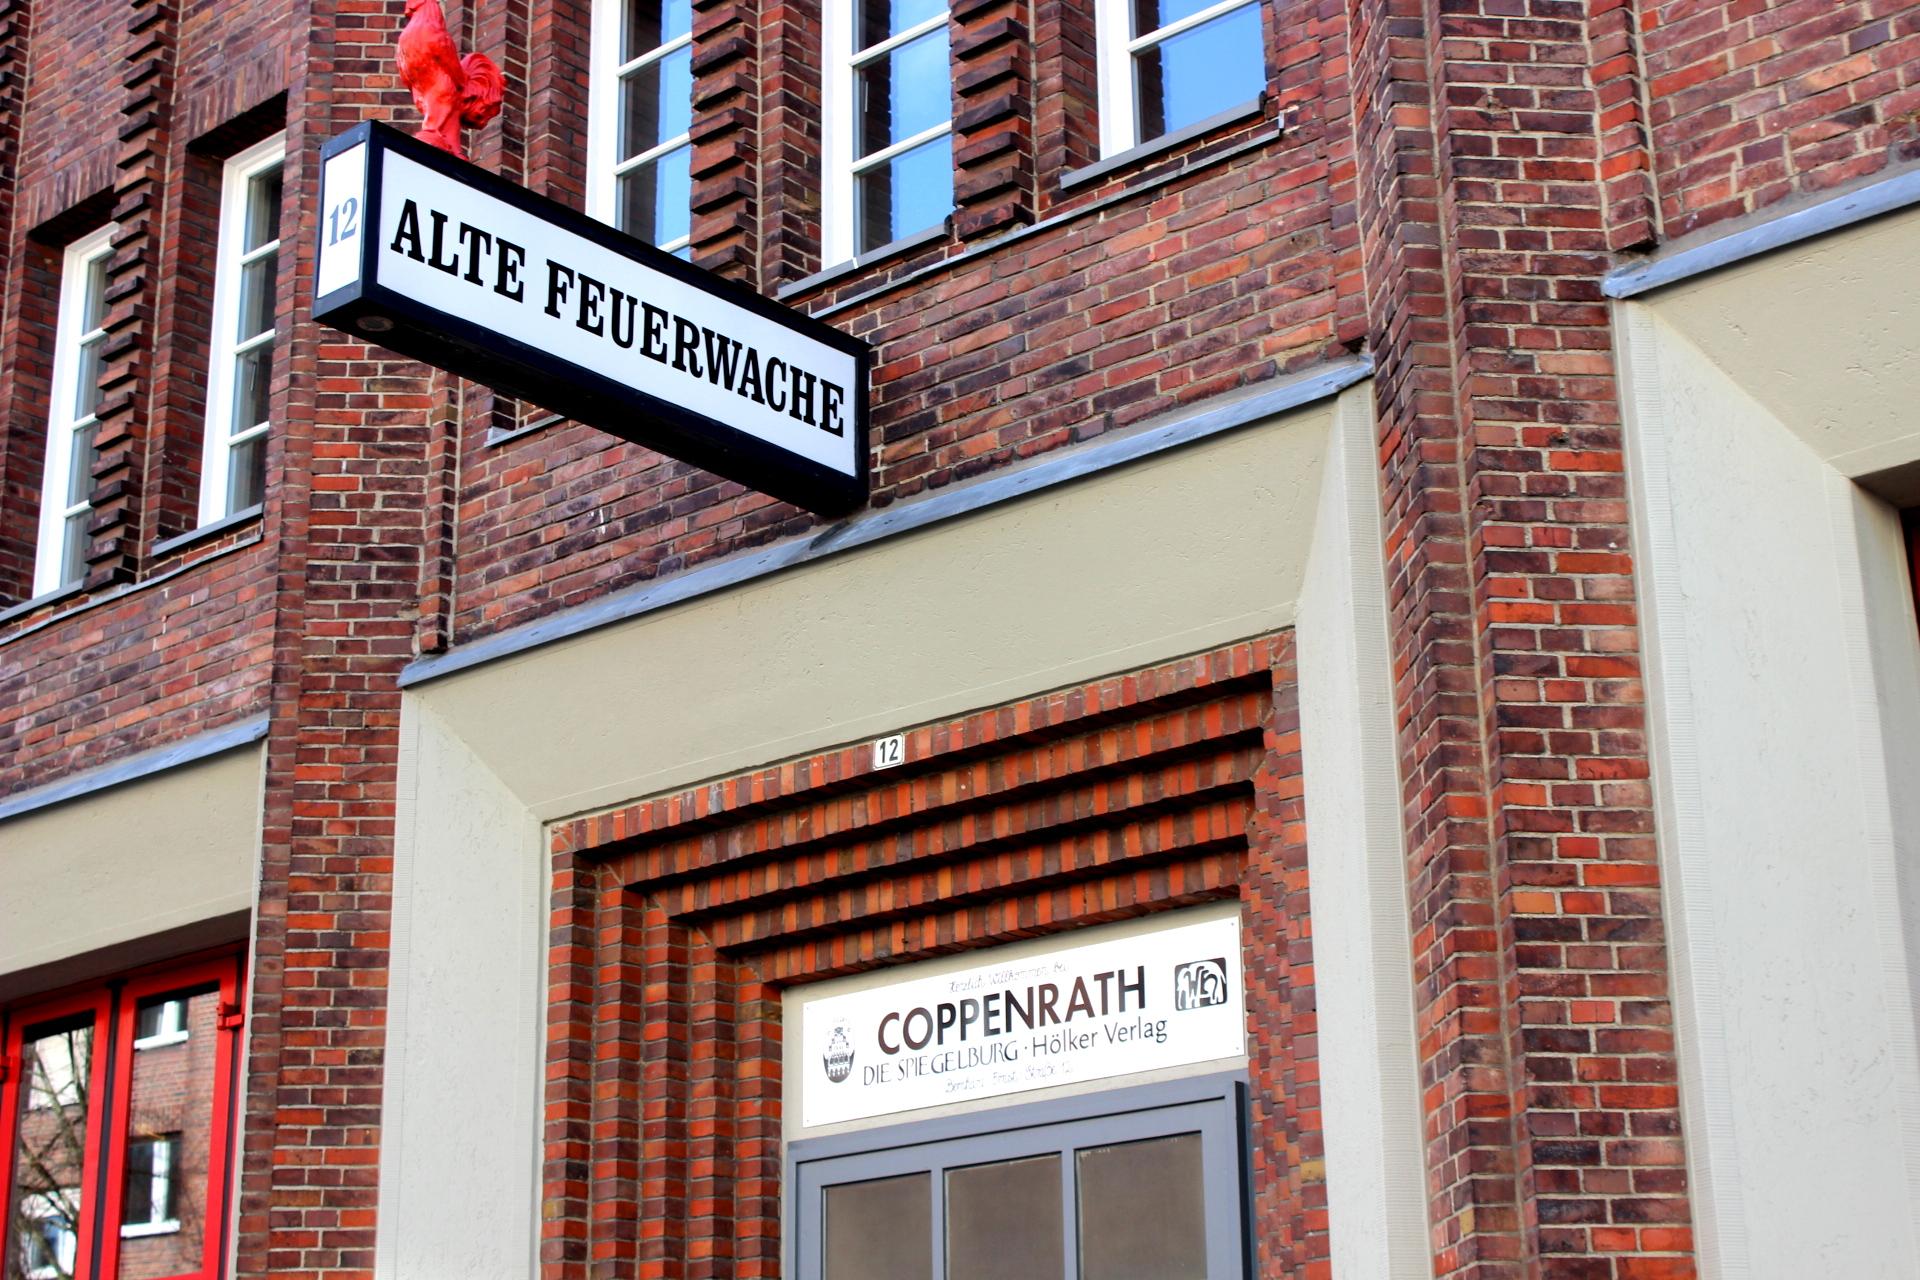 Coppenrath Verlag Alte Feuerwache